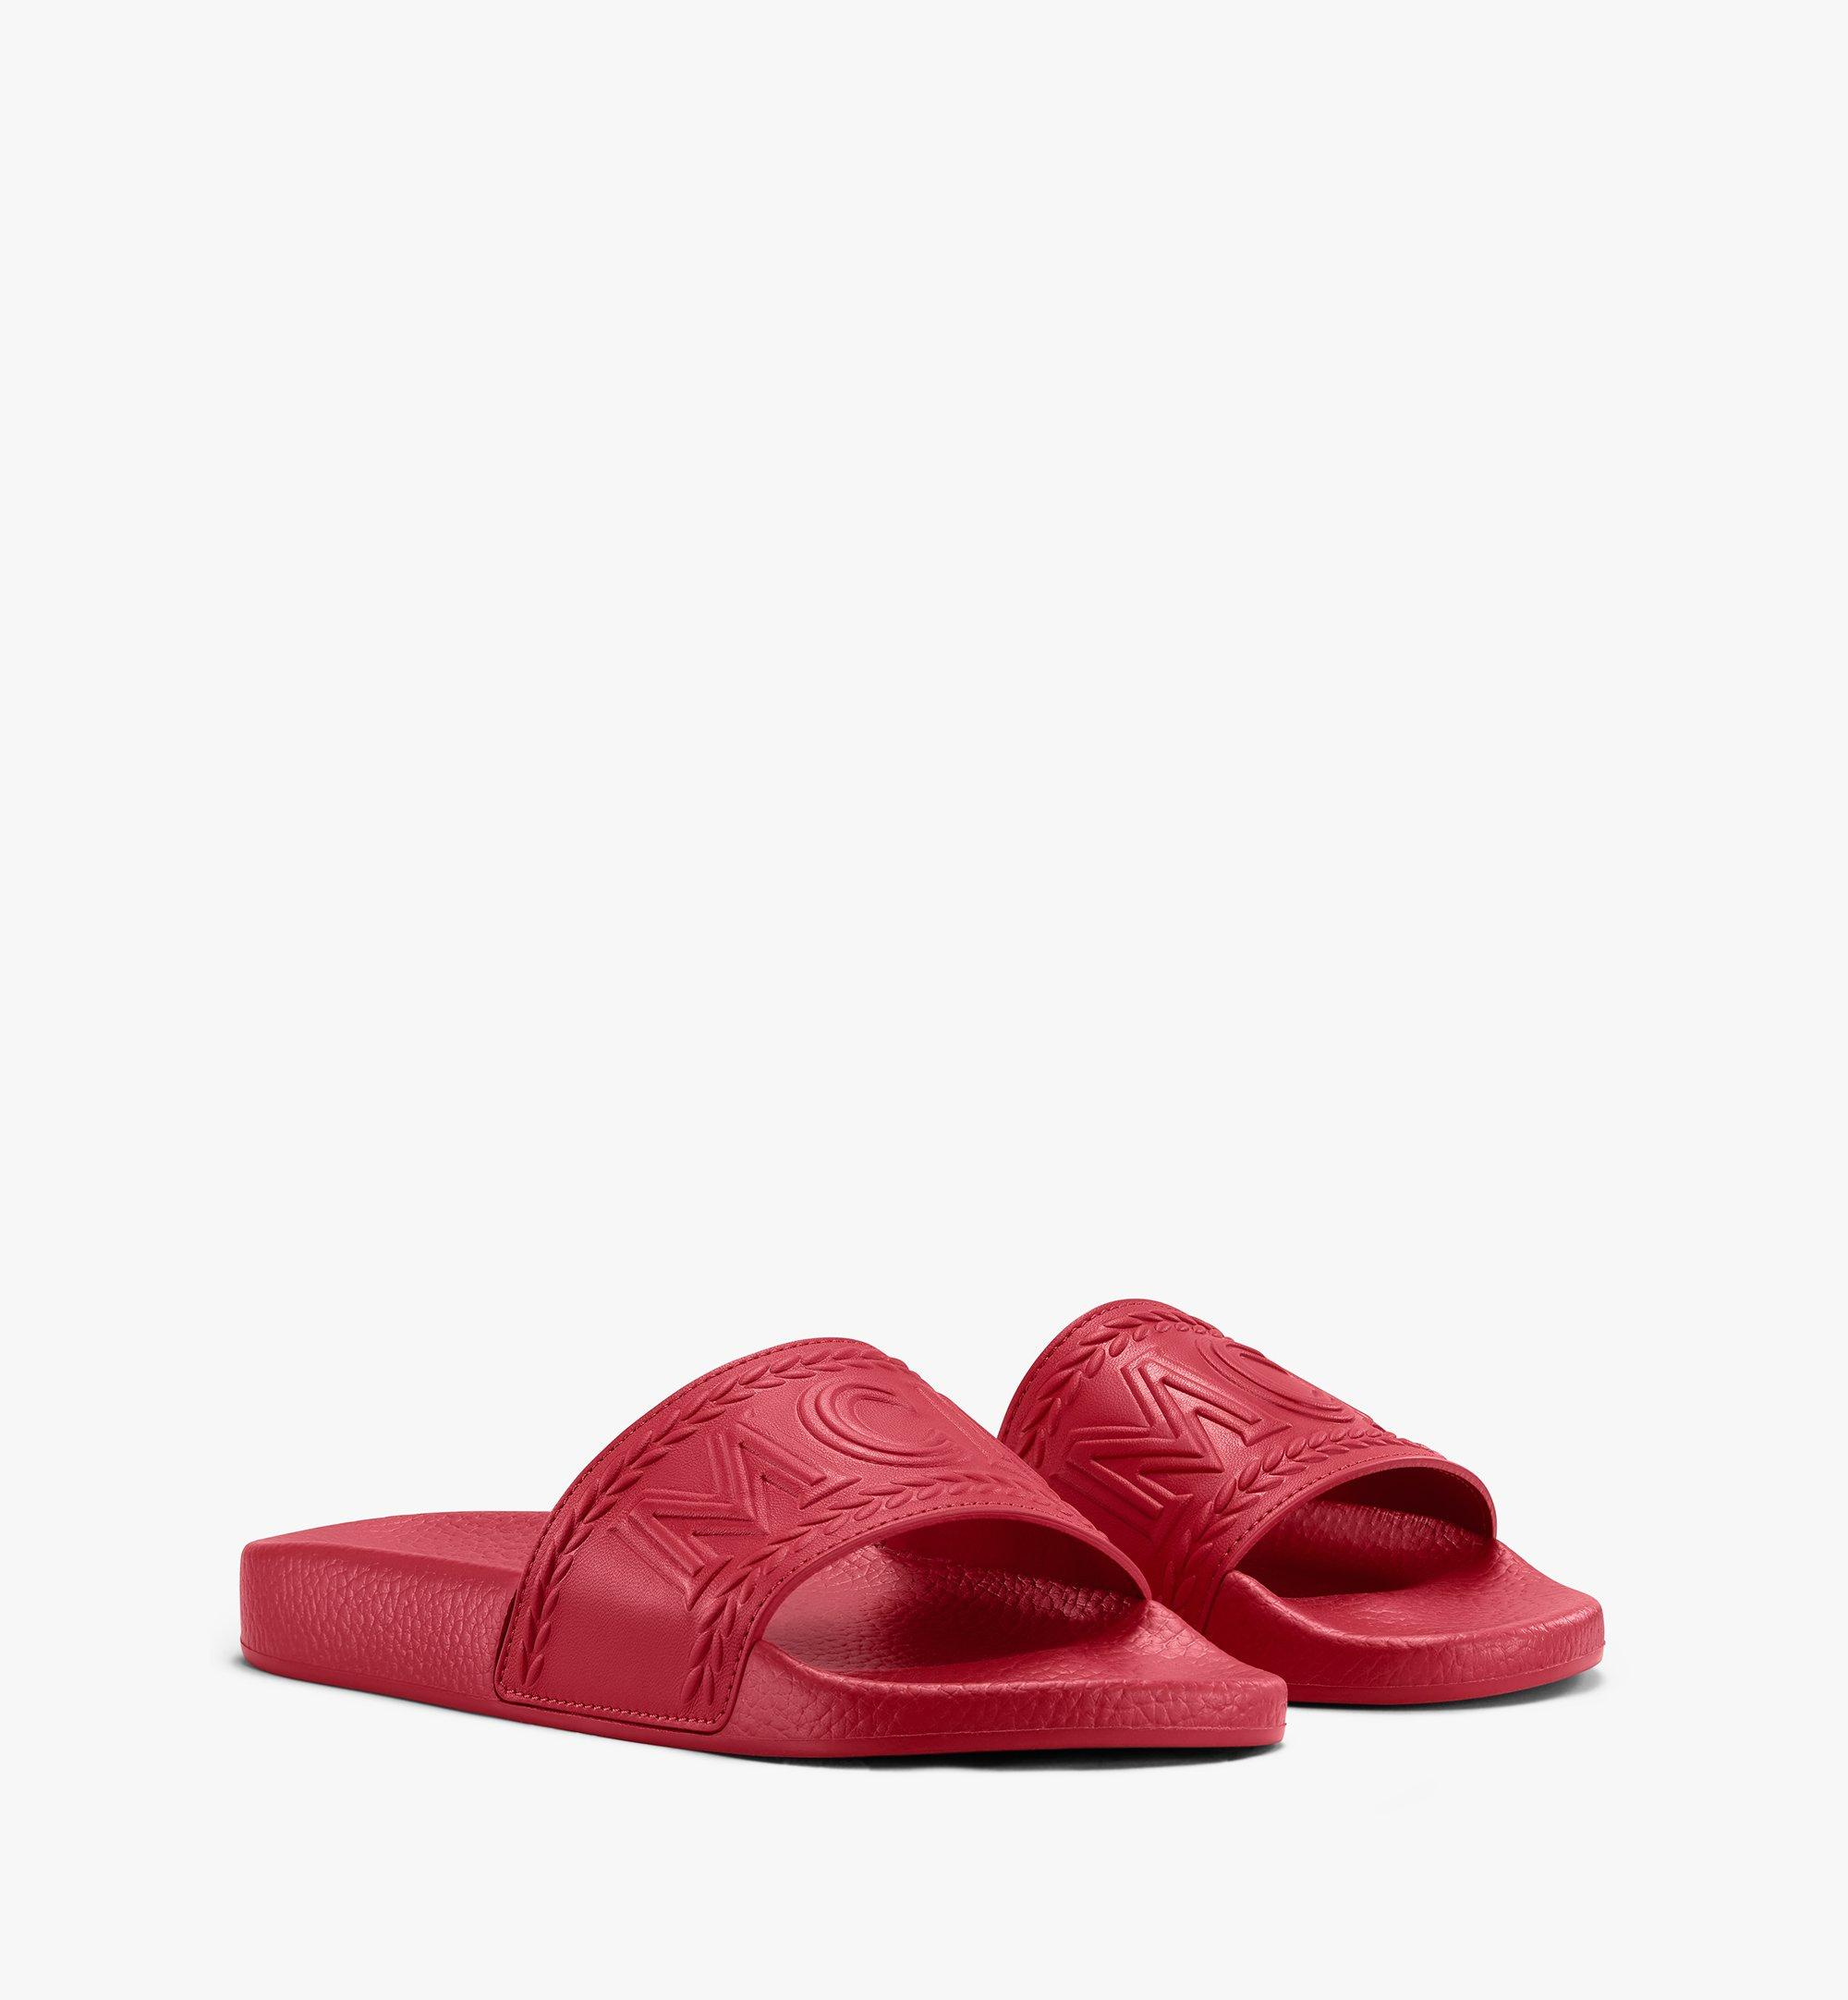 MCM 男士Big Logo拖鞋 Red MEXASMM21R4041 更多视角 1